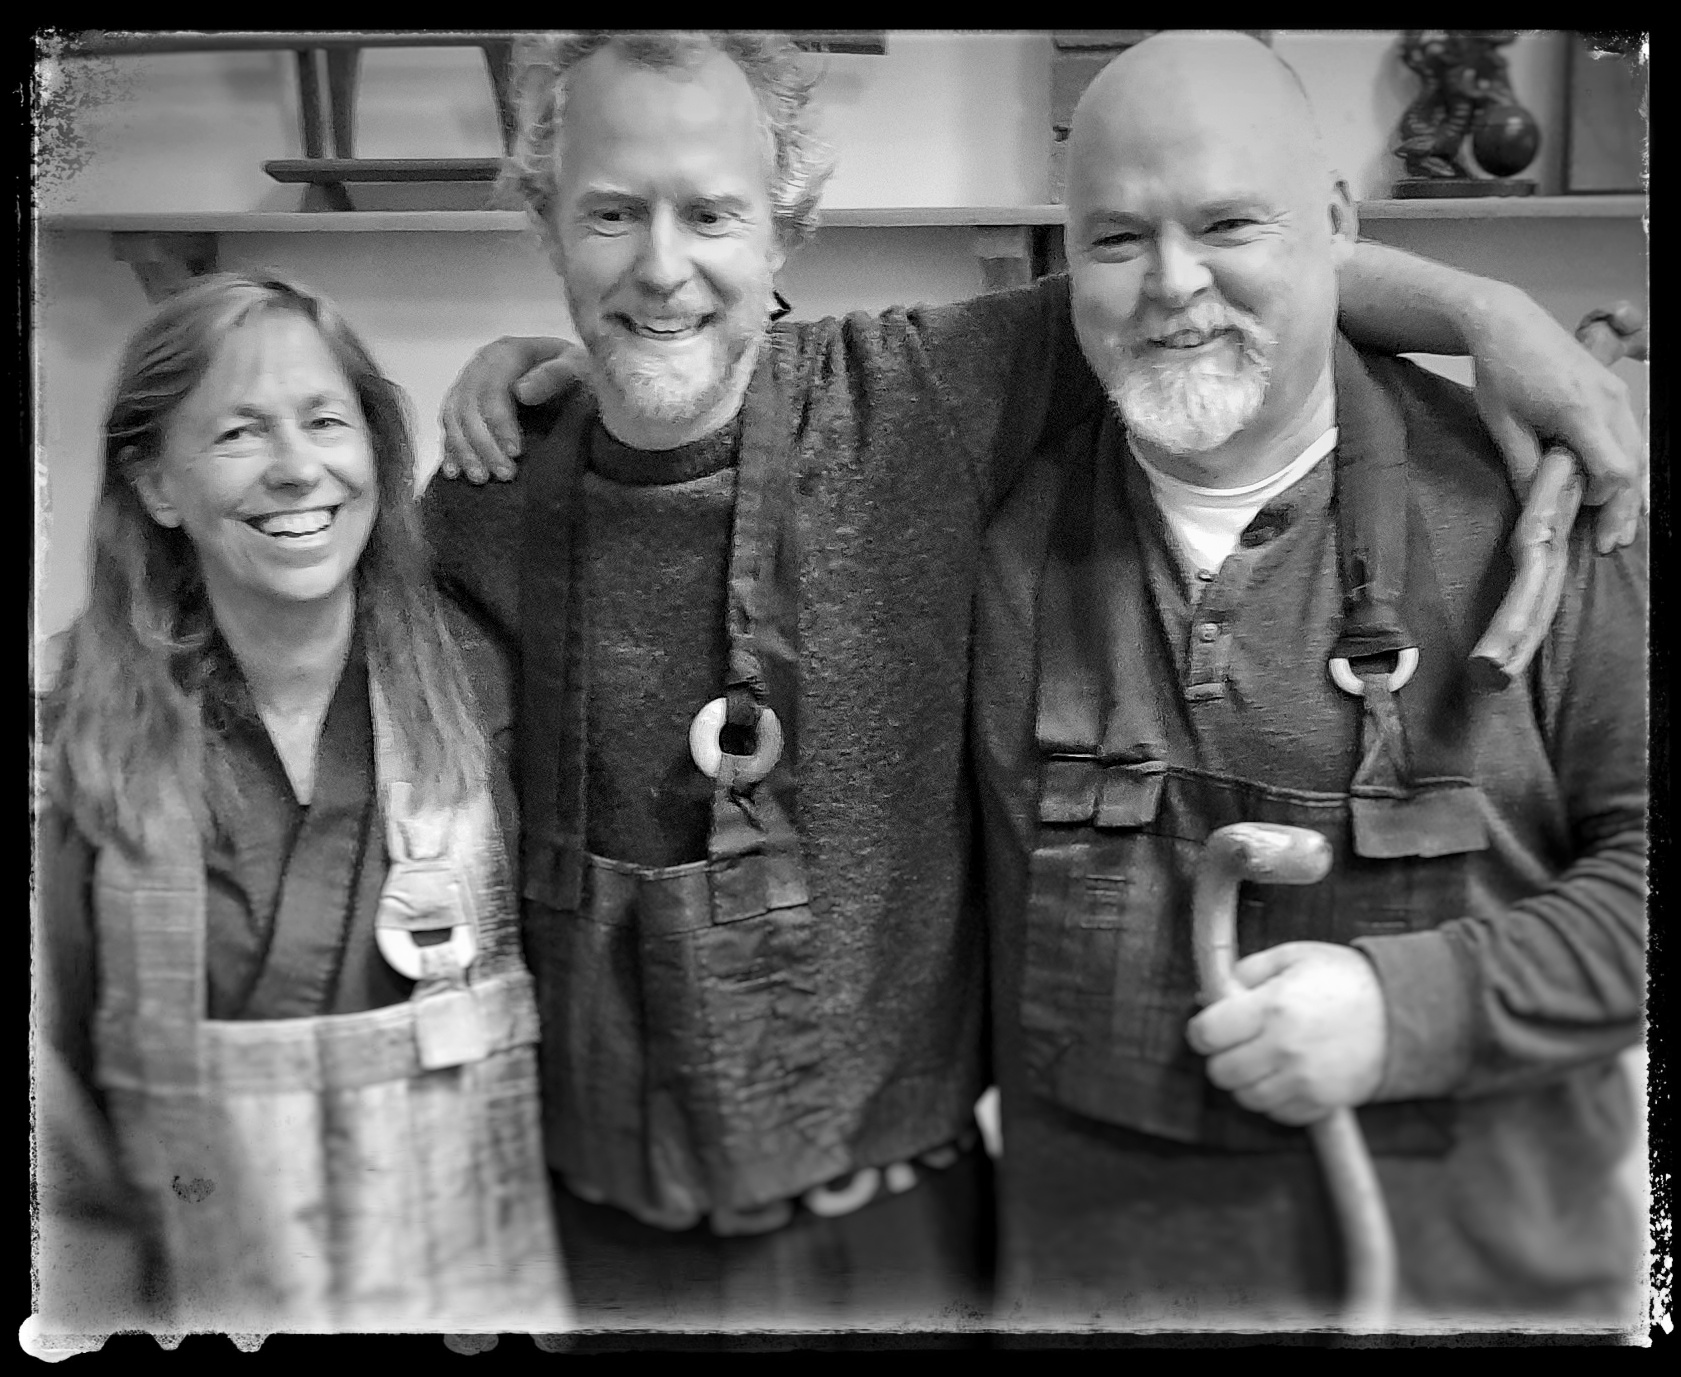 Susan Murphy Roshi, Kynan Sutherland Sensei and Kirk Fisher Sensei. Photography by Ron C. Moss